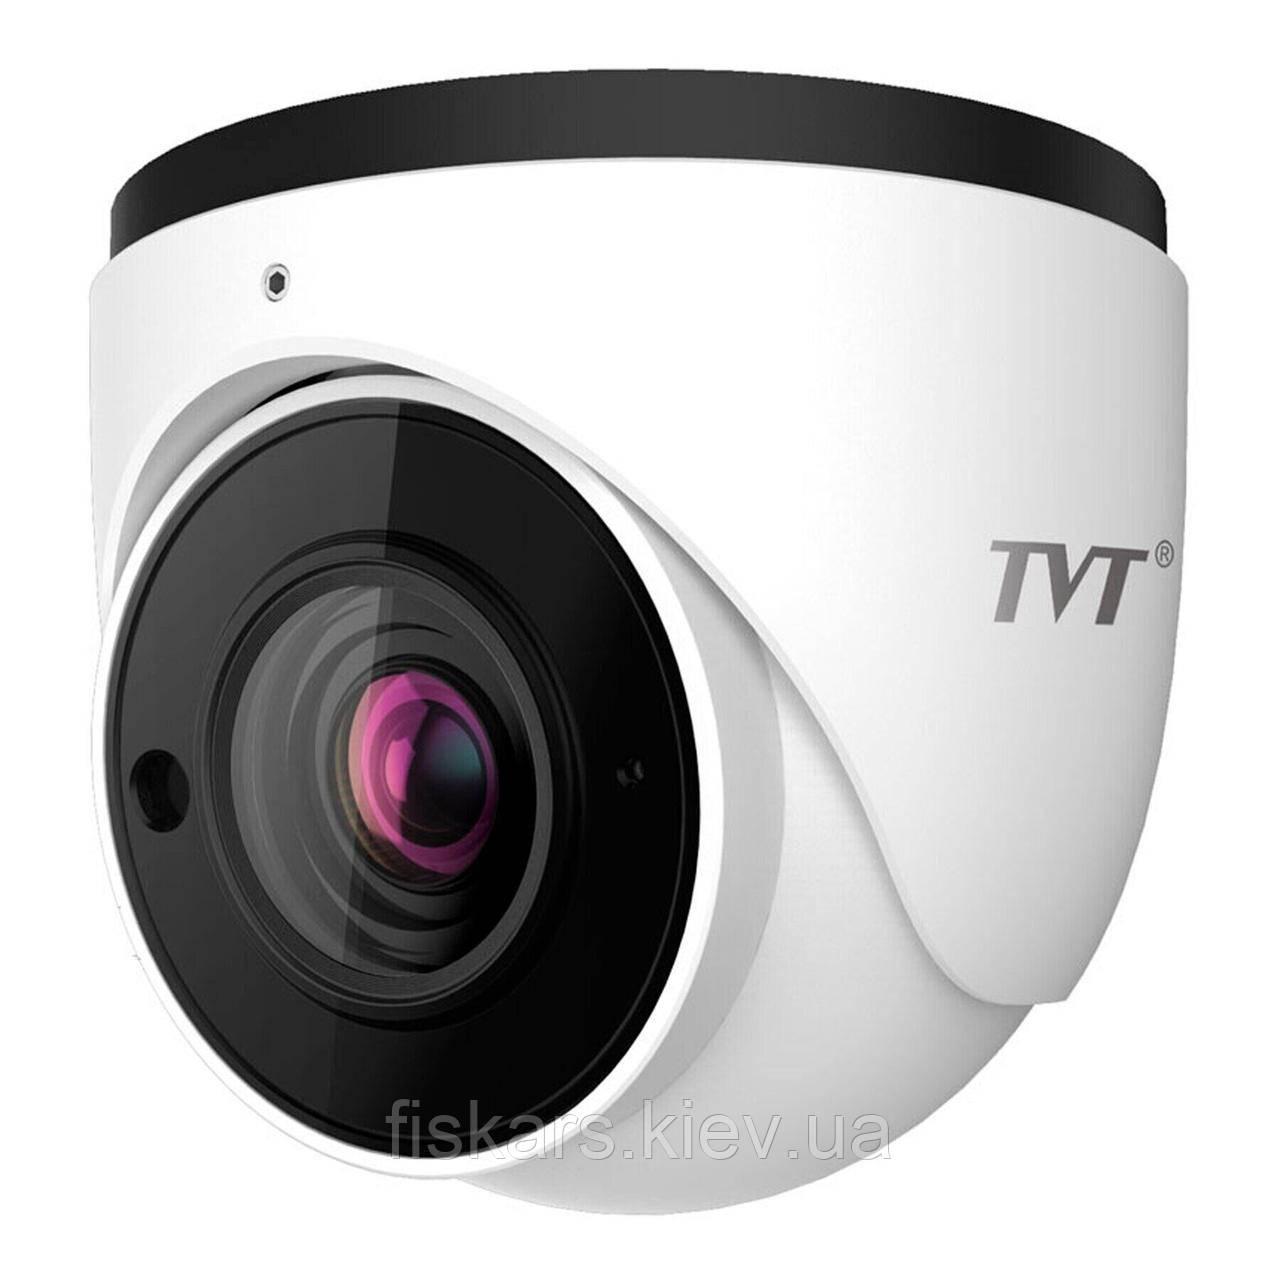 2 Мп IP-камера с видеоаналитикой TVT Digital TD-9525E3 (D/AZ/PE/AR3)